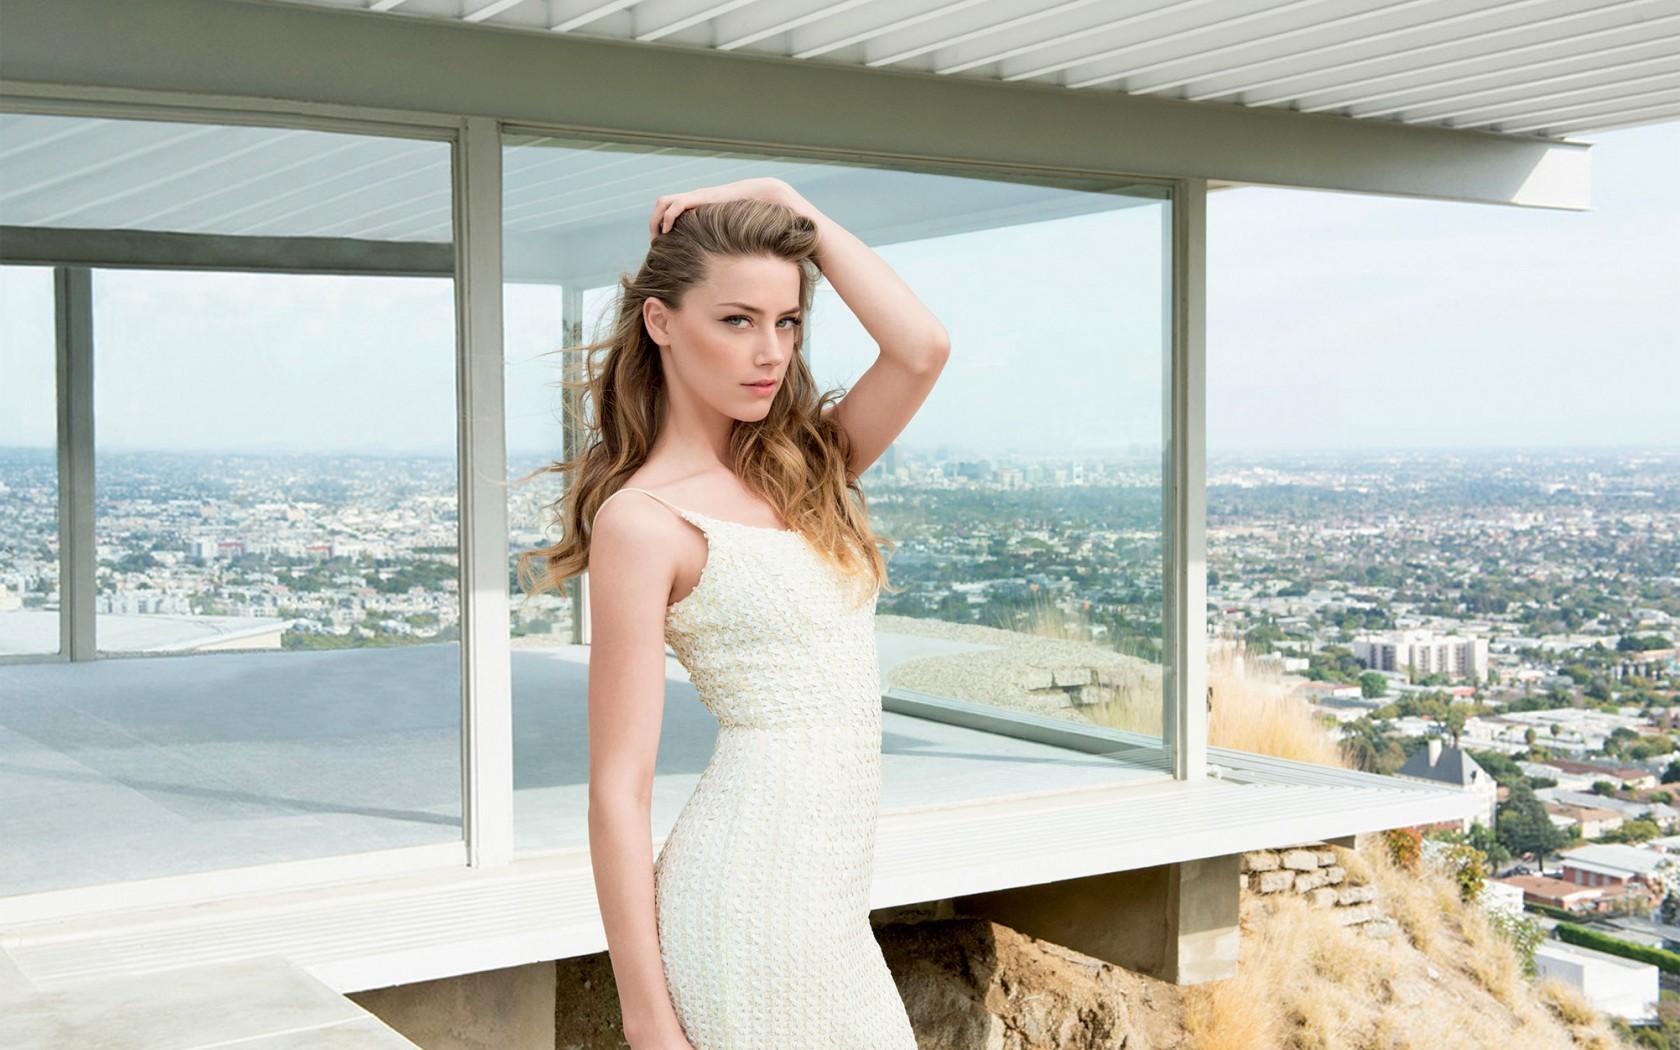 Wallpaper Model Cityscape Long Hair Looking At Viewer Actress